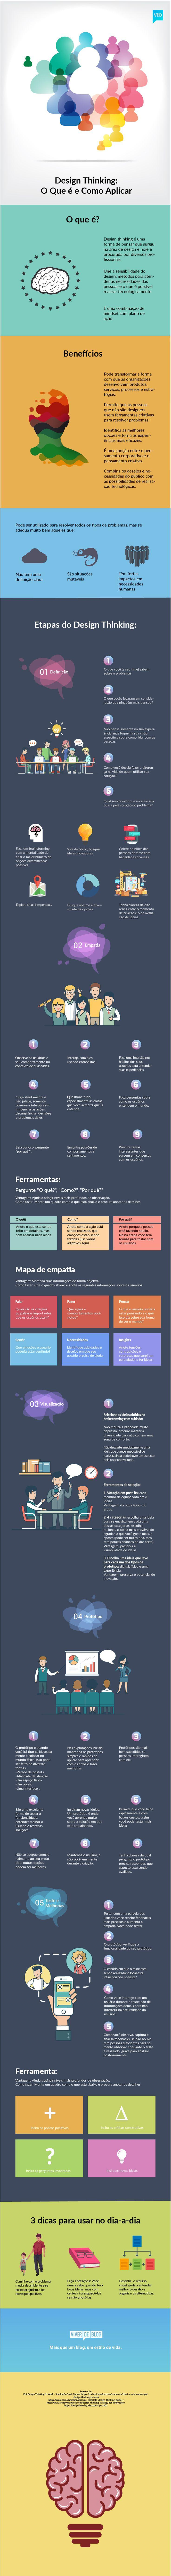 Infografico-Design-Thinking-2